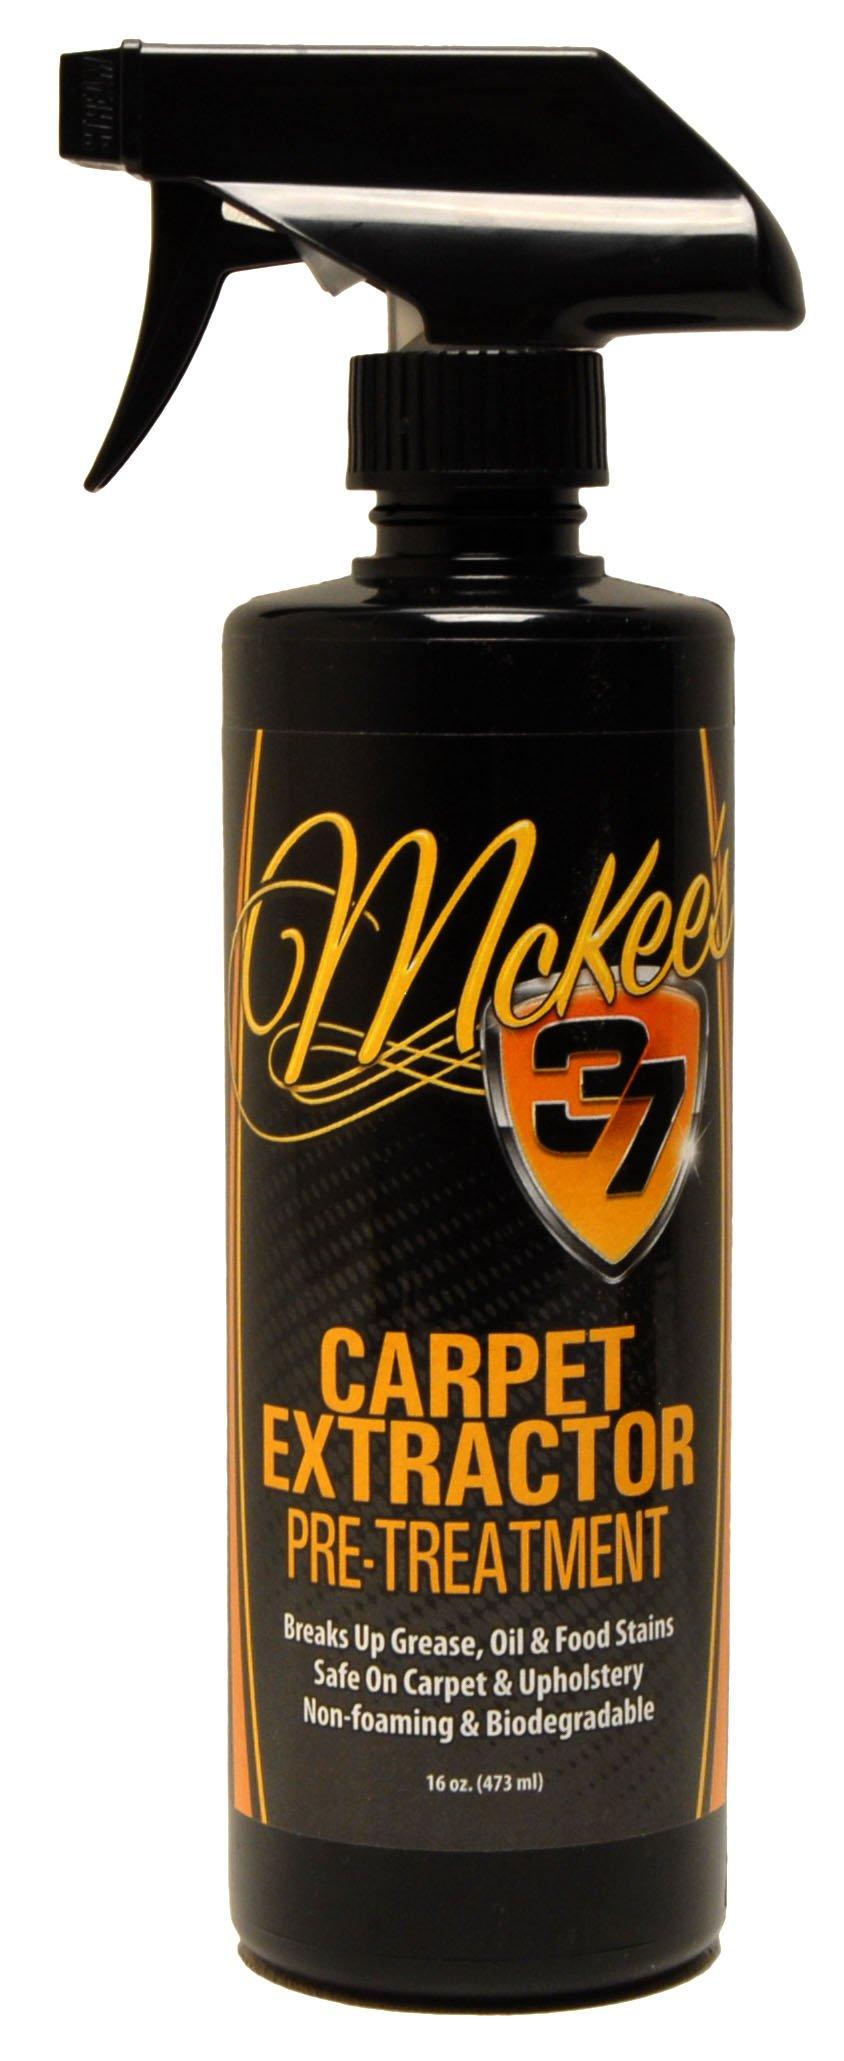 McKee's 37 MK37-390 McKee's Carpet Extractor Pre-Treatment, 16. Fluid_Ounces